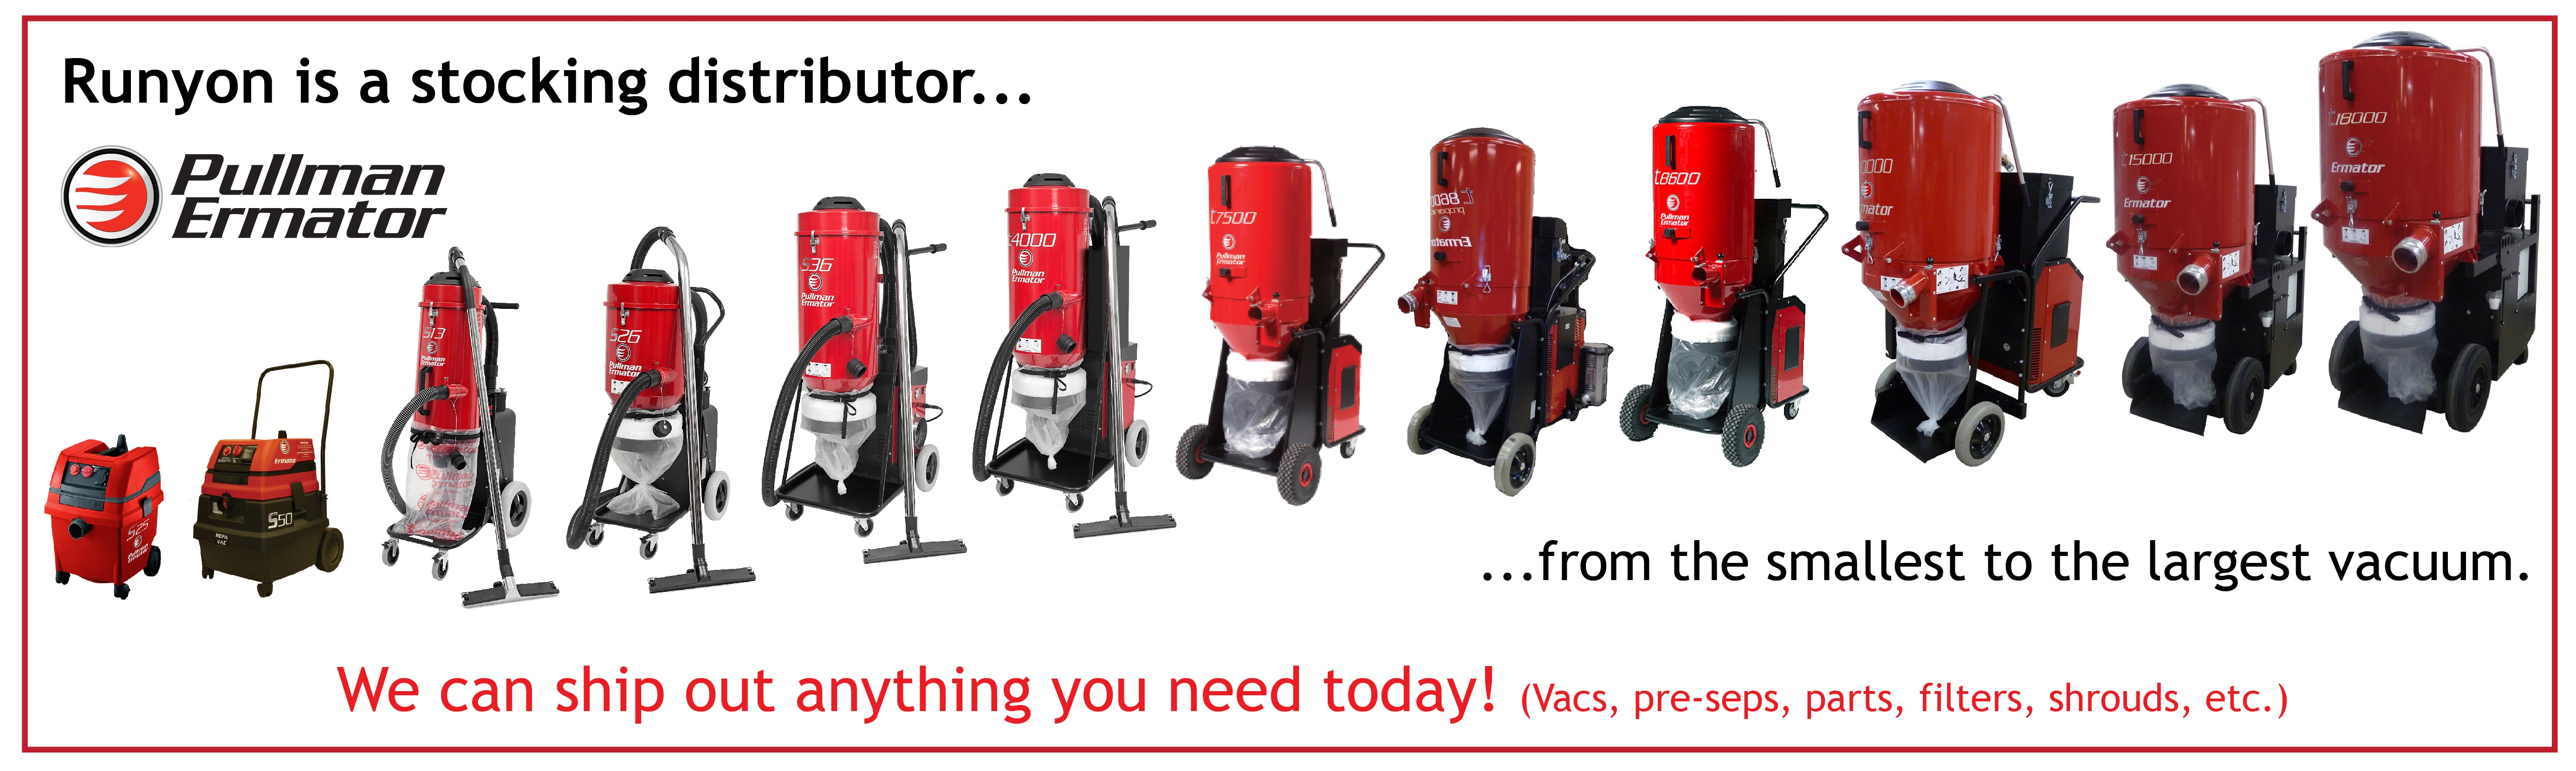 Pullman Ermator Vacuum Line Dust Extraction Equipment